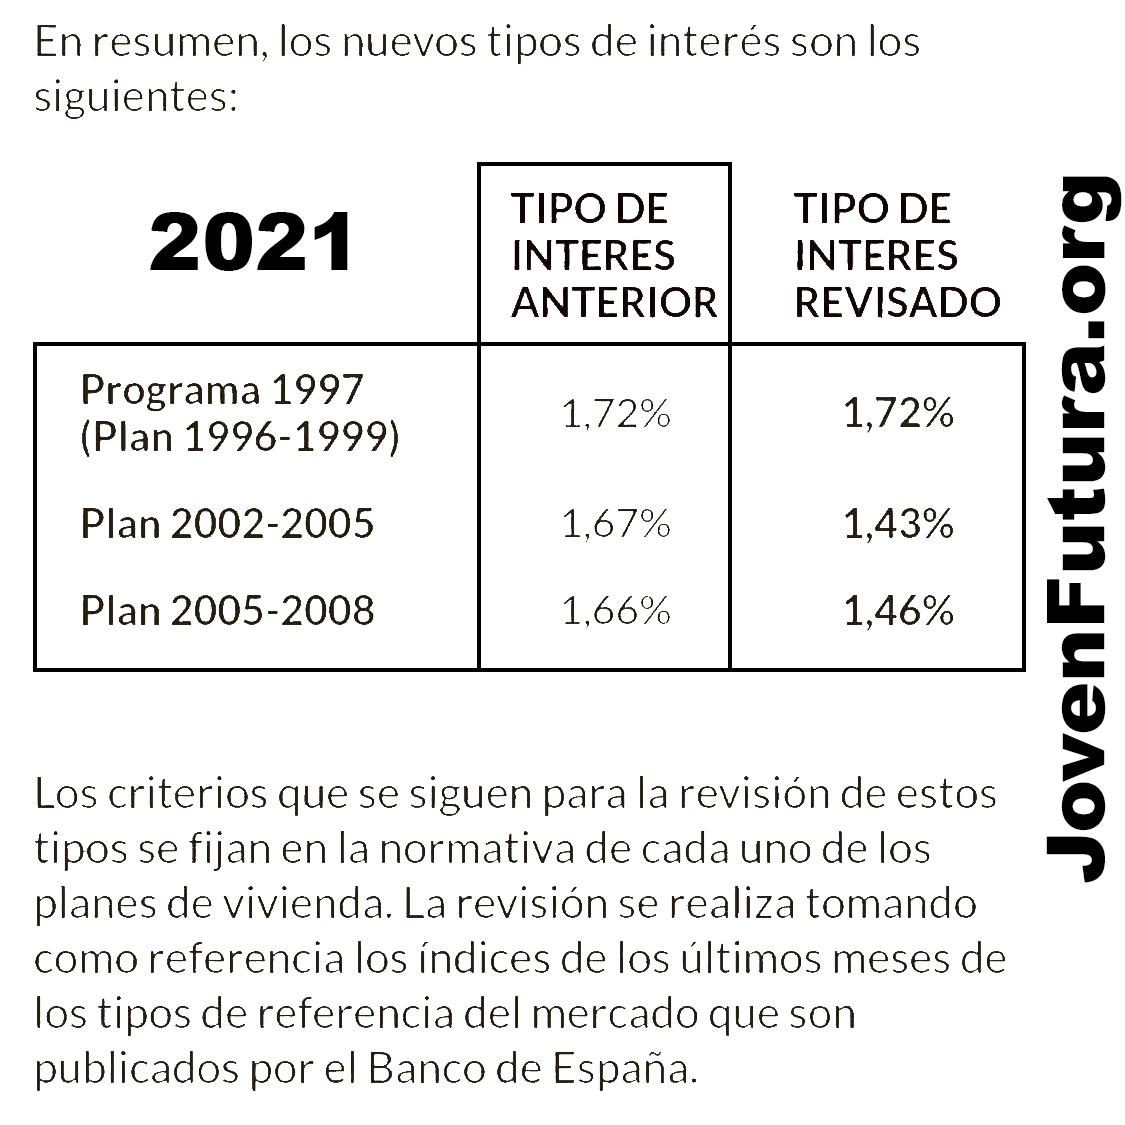 Tipos de interés VPO 2021 - jovenfutura.org -